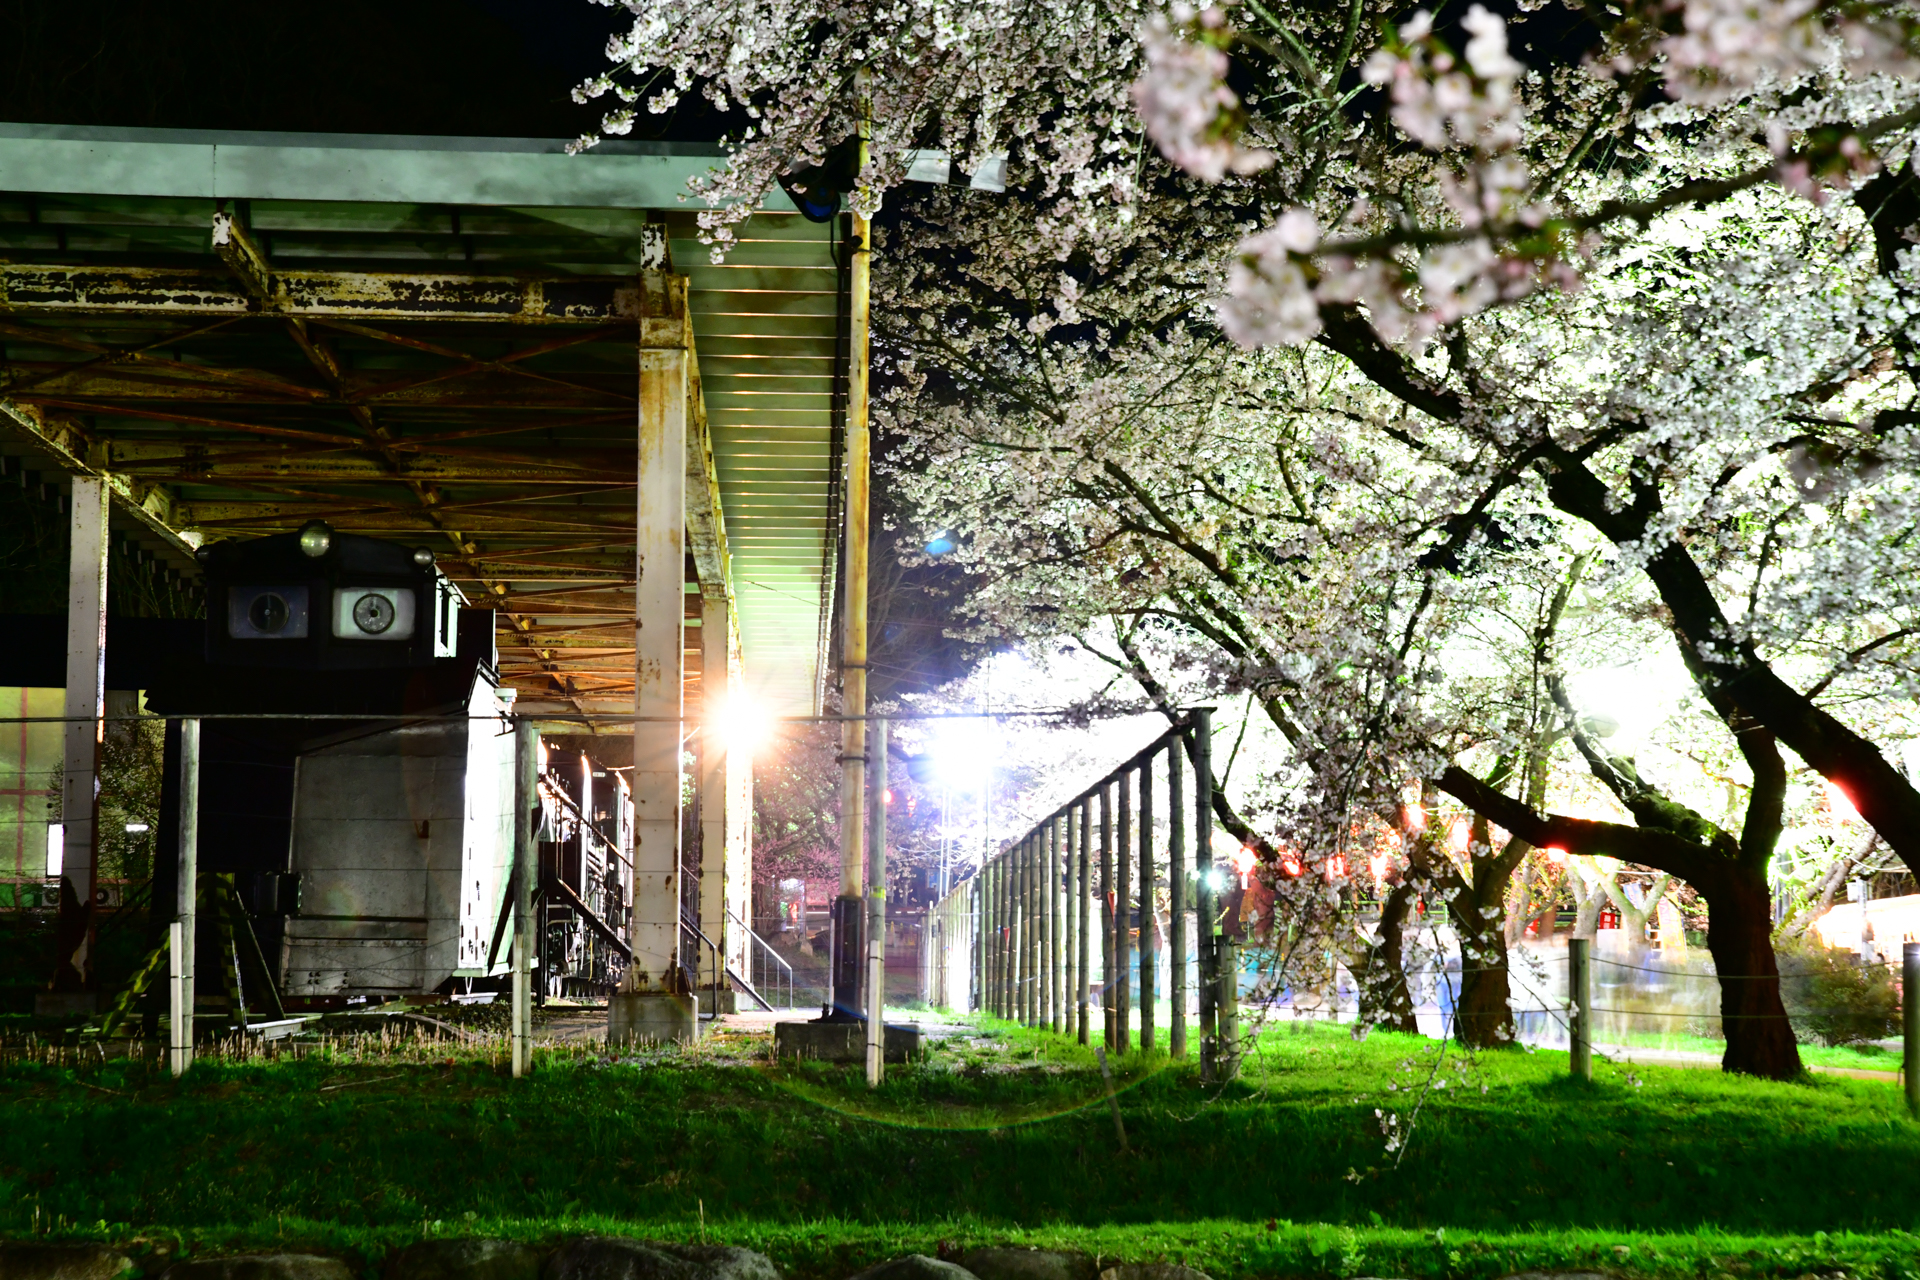 D850+SP 24-70mm F/2.8 Di VC USD G2 岩手県北上市 北上展勝地の夜桜